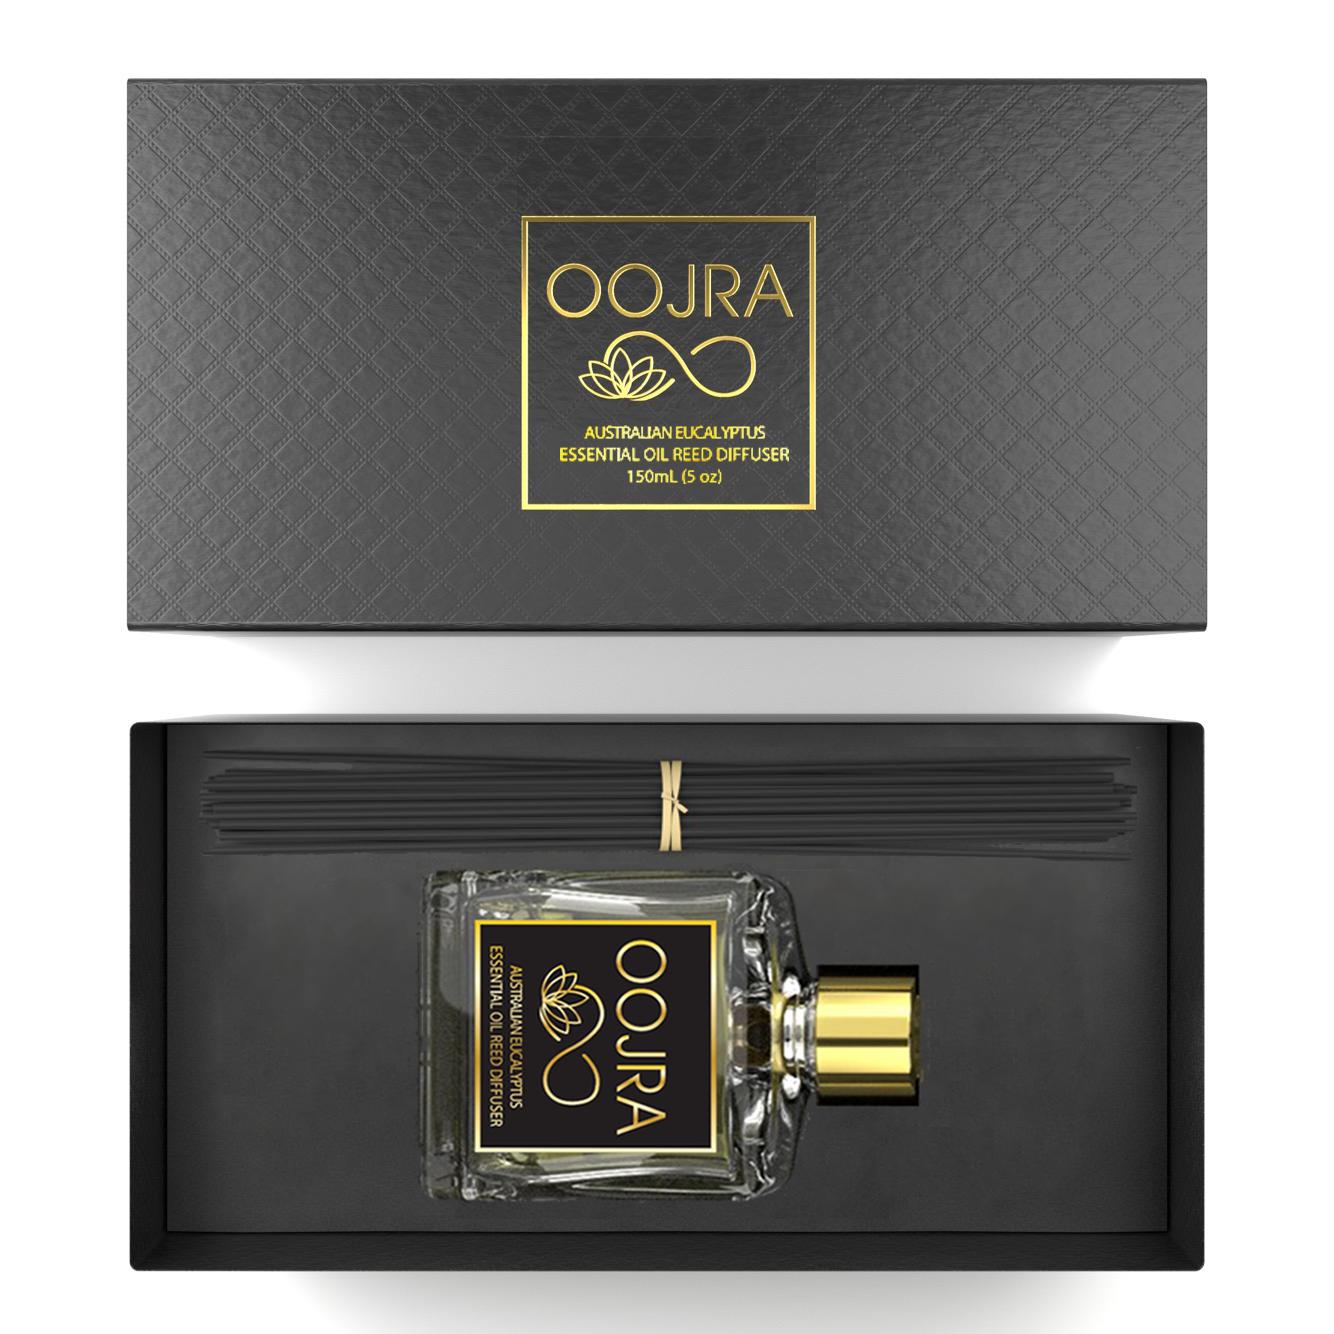 Oojra's Australian Eucalyptus essential oil reed diffuser